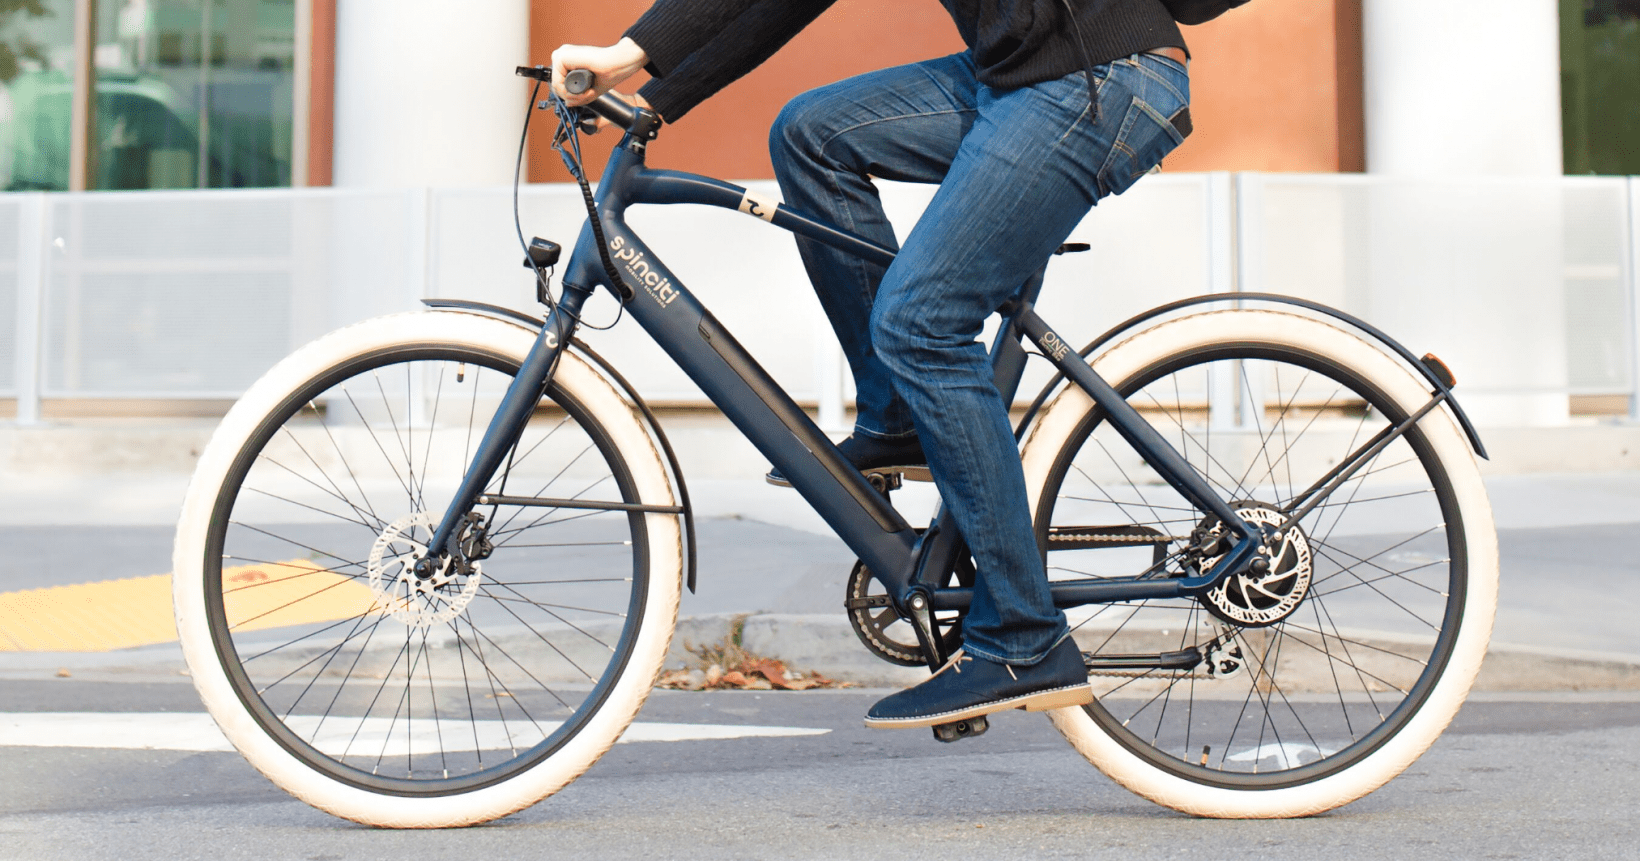 The Spinciti Amsterdam is a stylish e-bike that won't break the bank